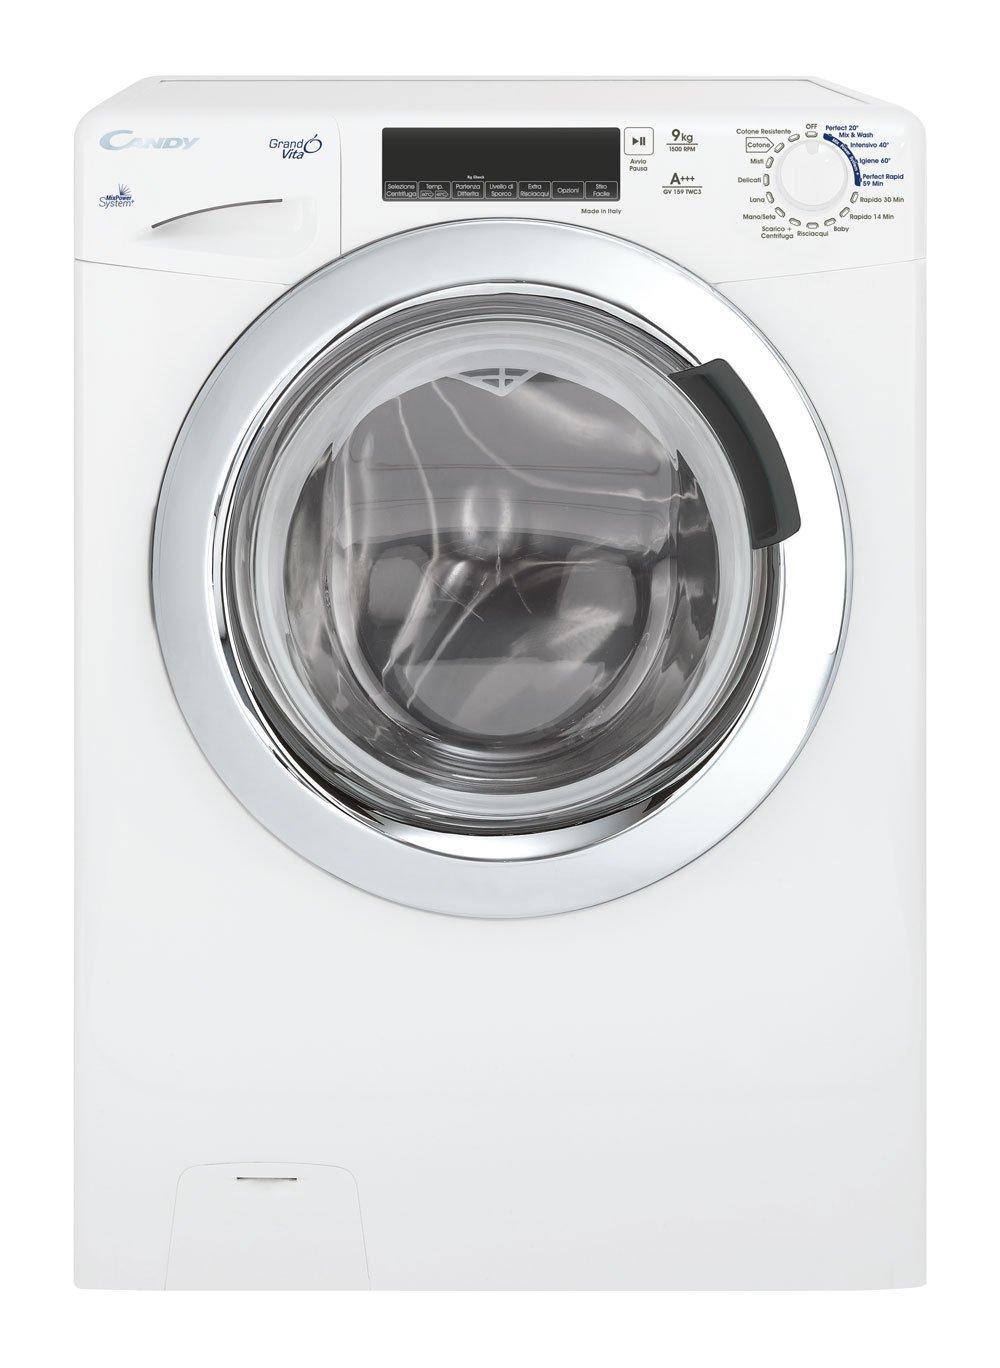 Lavatrici Per Grandi Carichi Anche Loblò è Extra Large Cose Di Casa